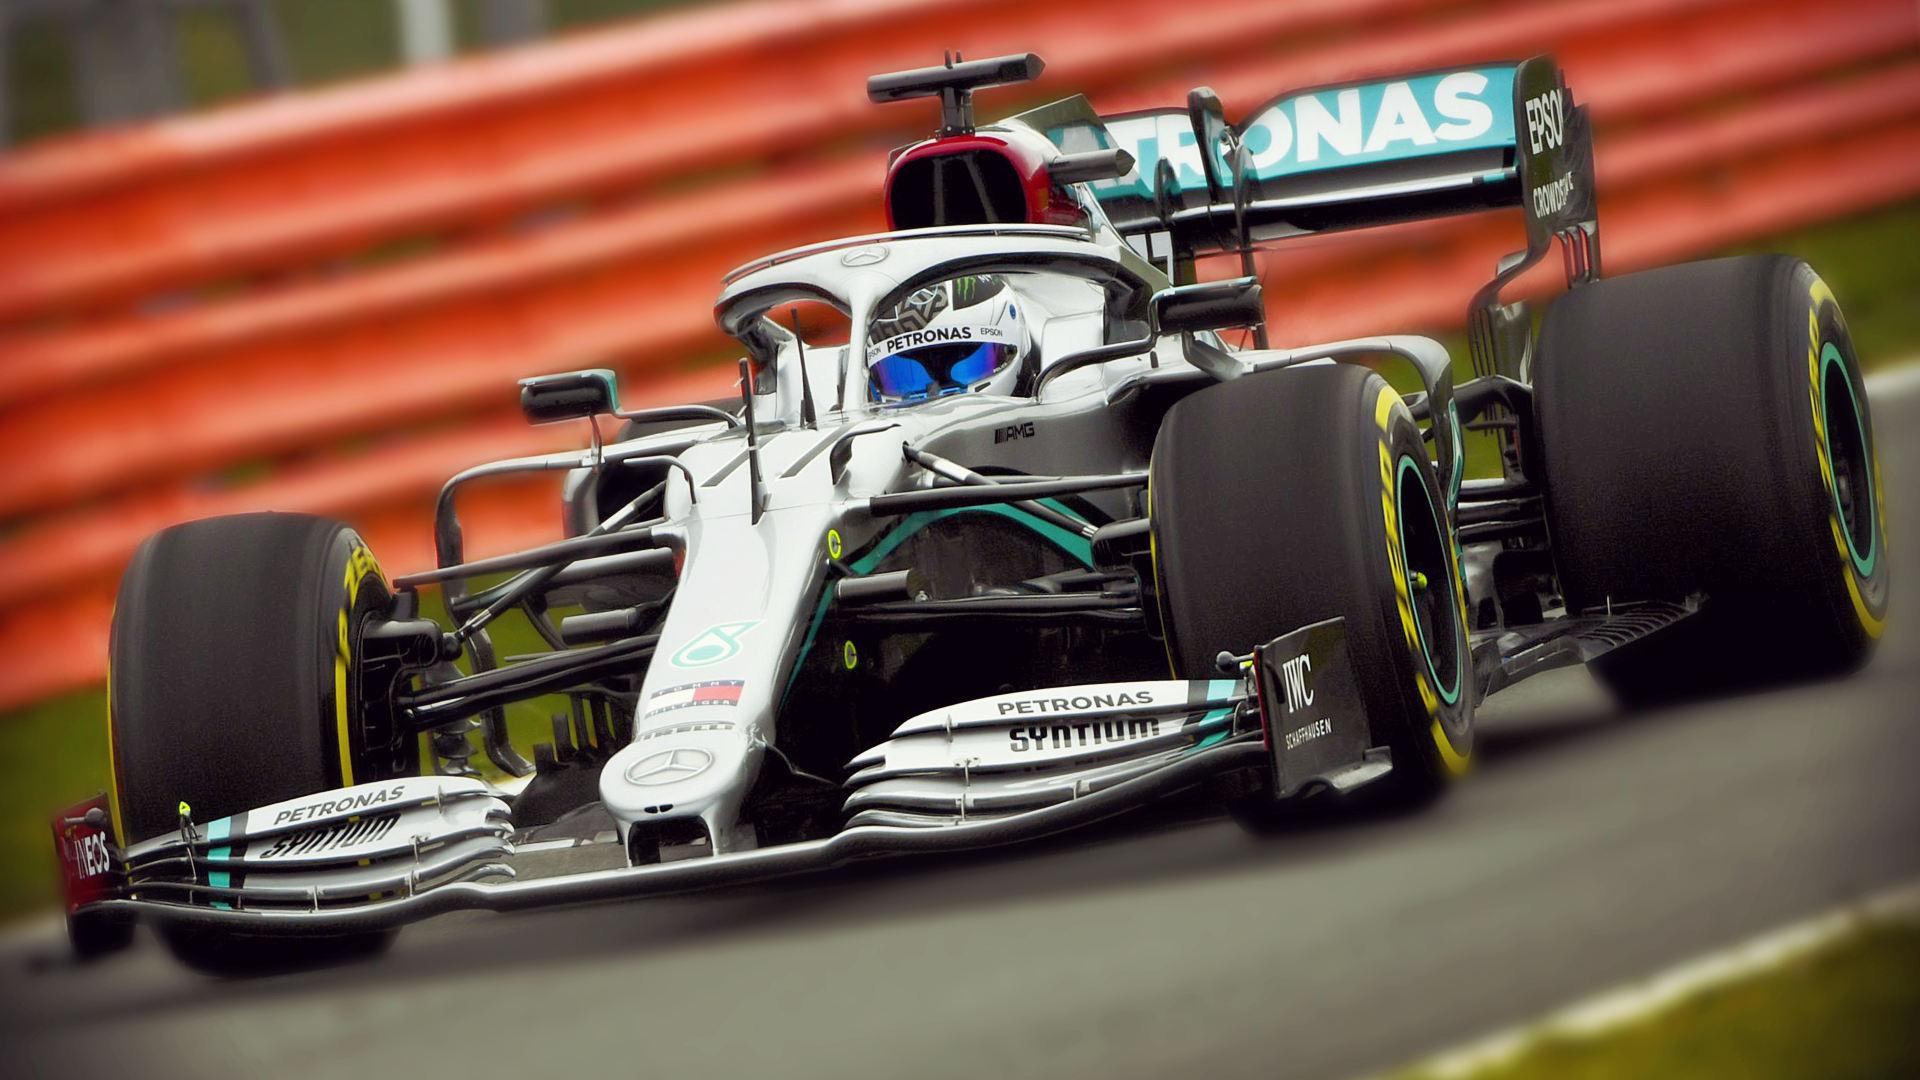 Mercedes 2020 F1 Car W11 Wallpaper Hd